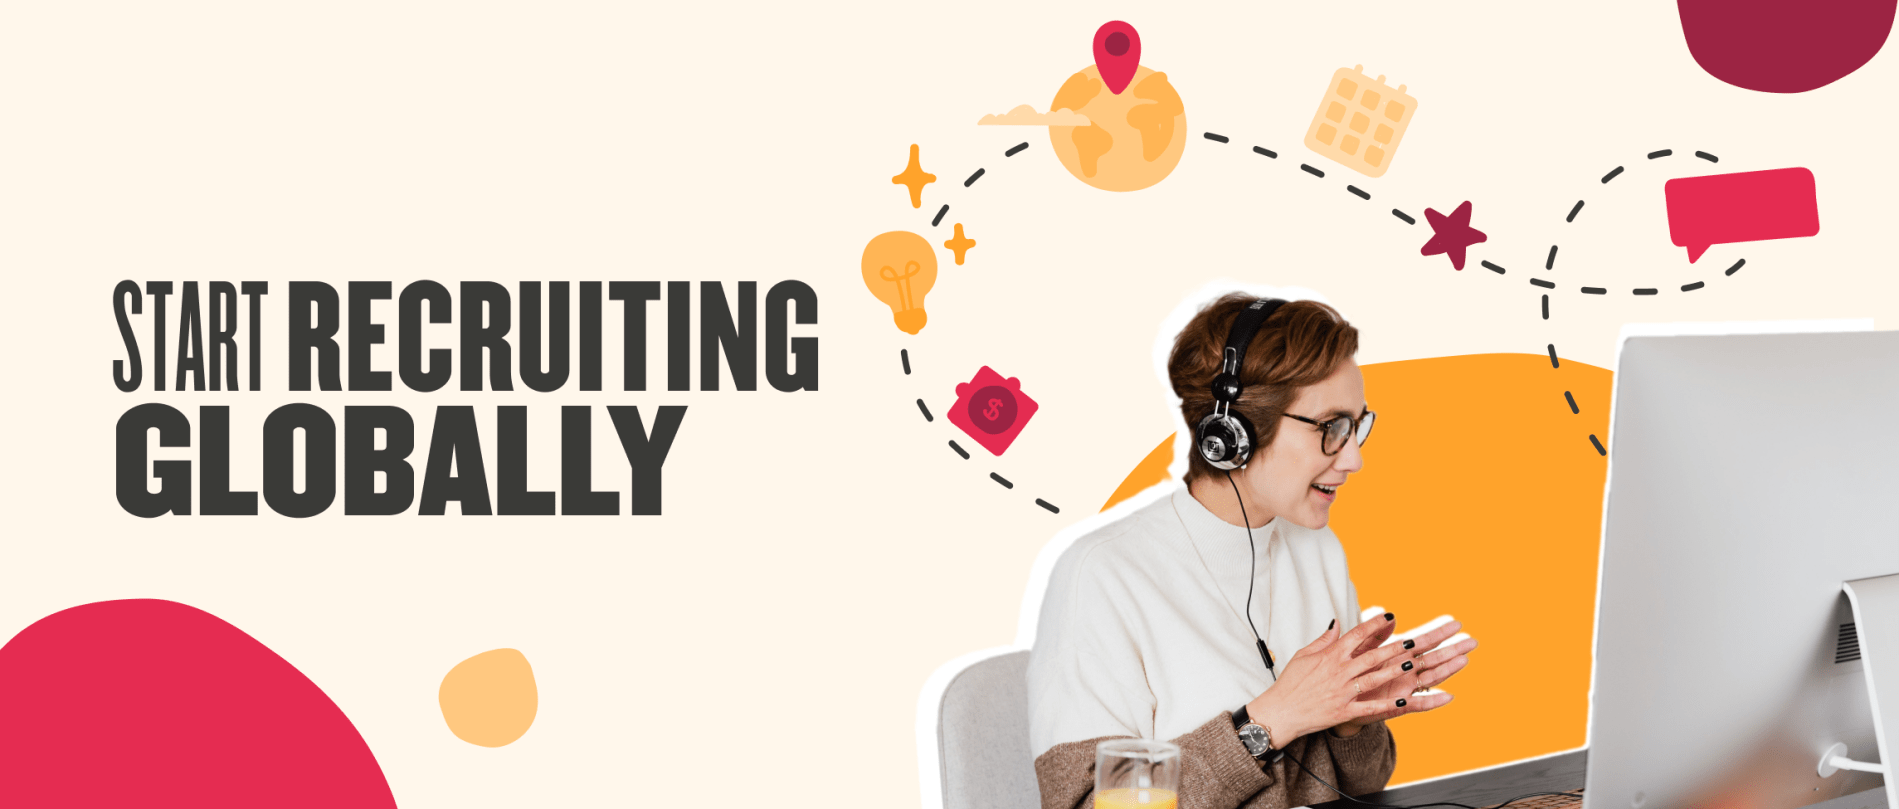 Start recruiting globally